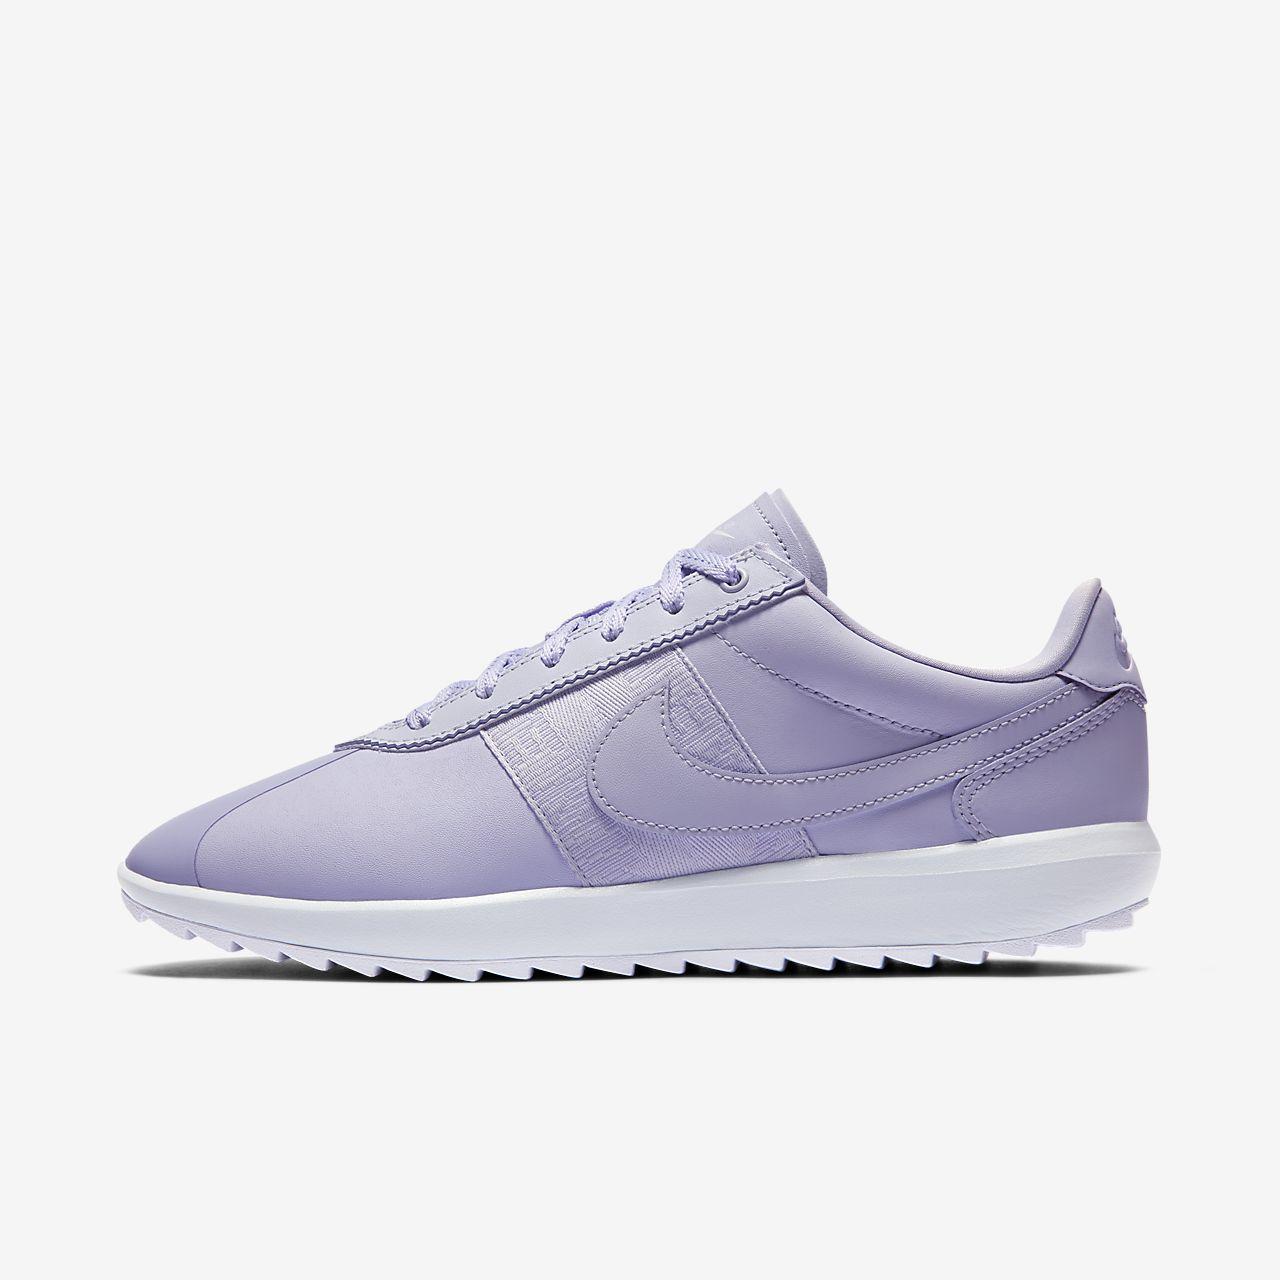 Nike Cortez G Sabatilles de golf - Dona